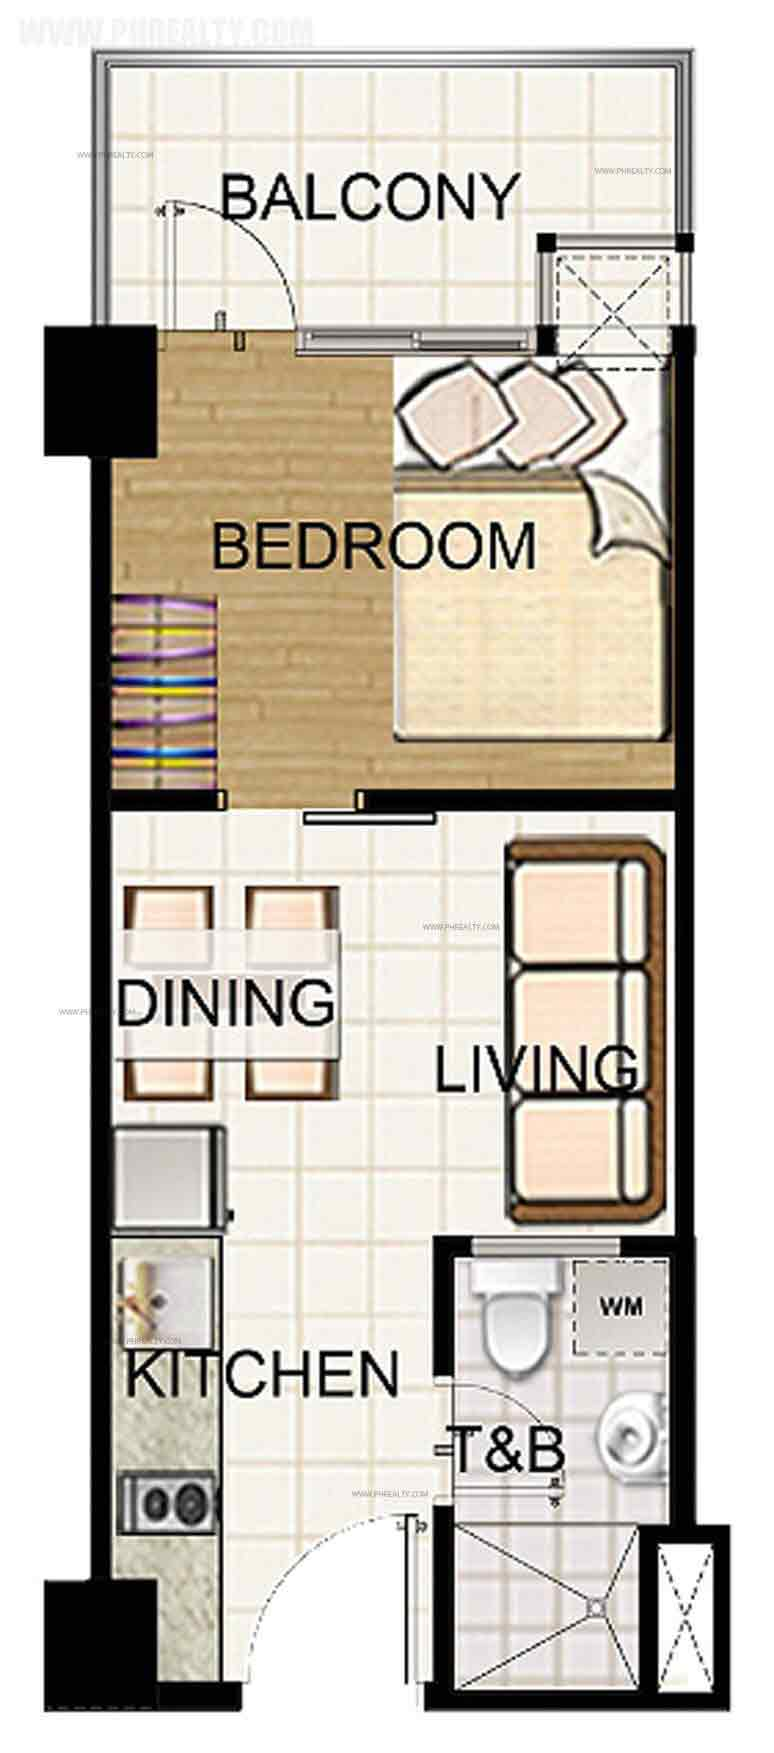 1 Bedroom Standard Unit with Balcony